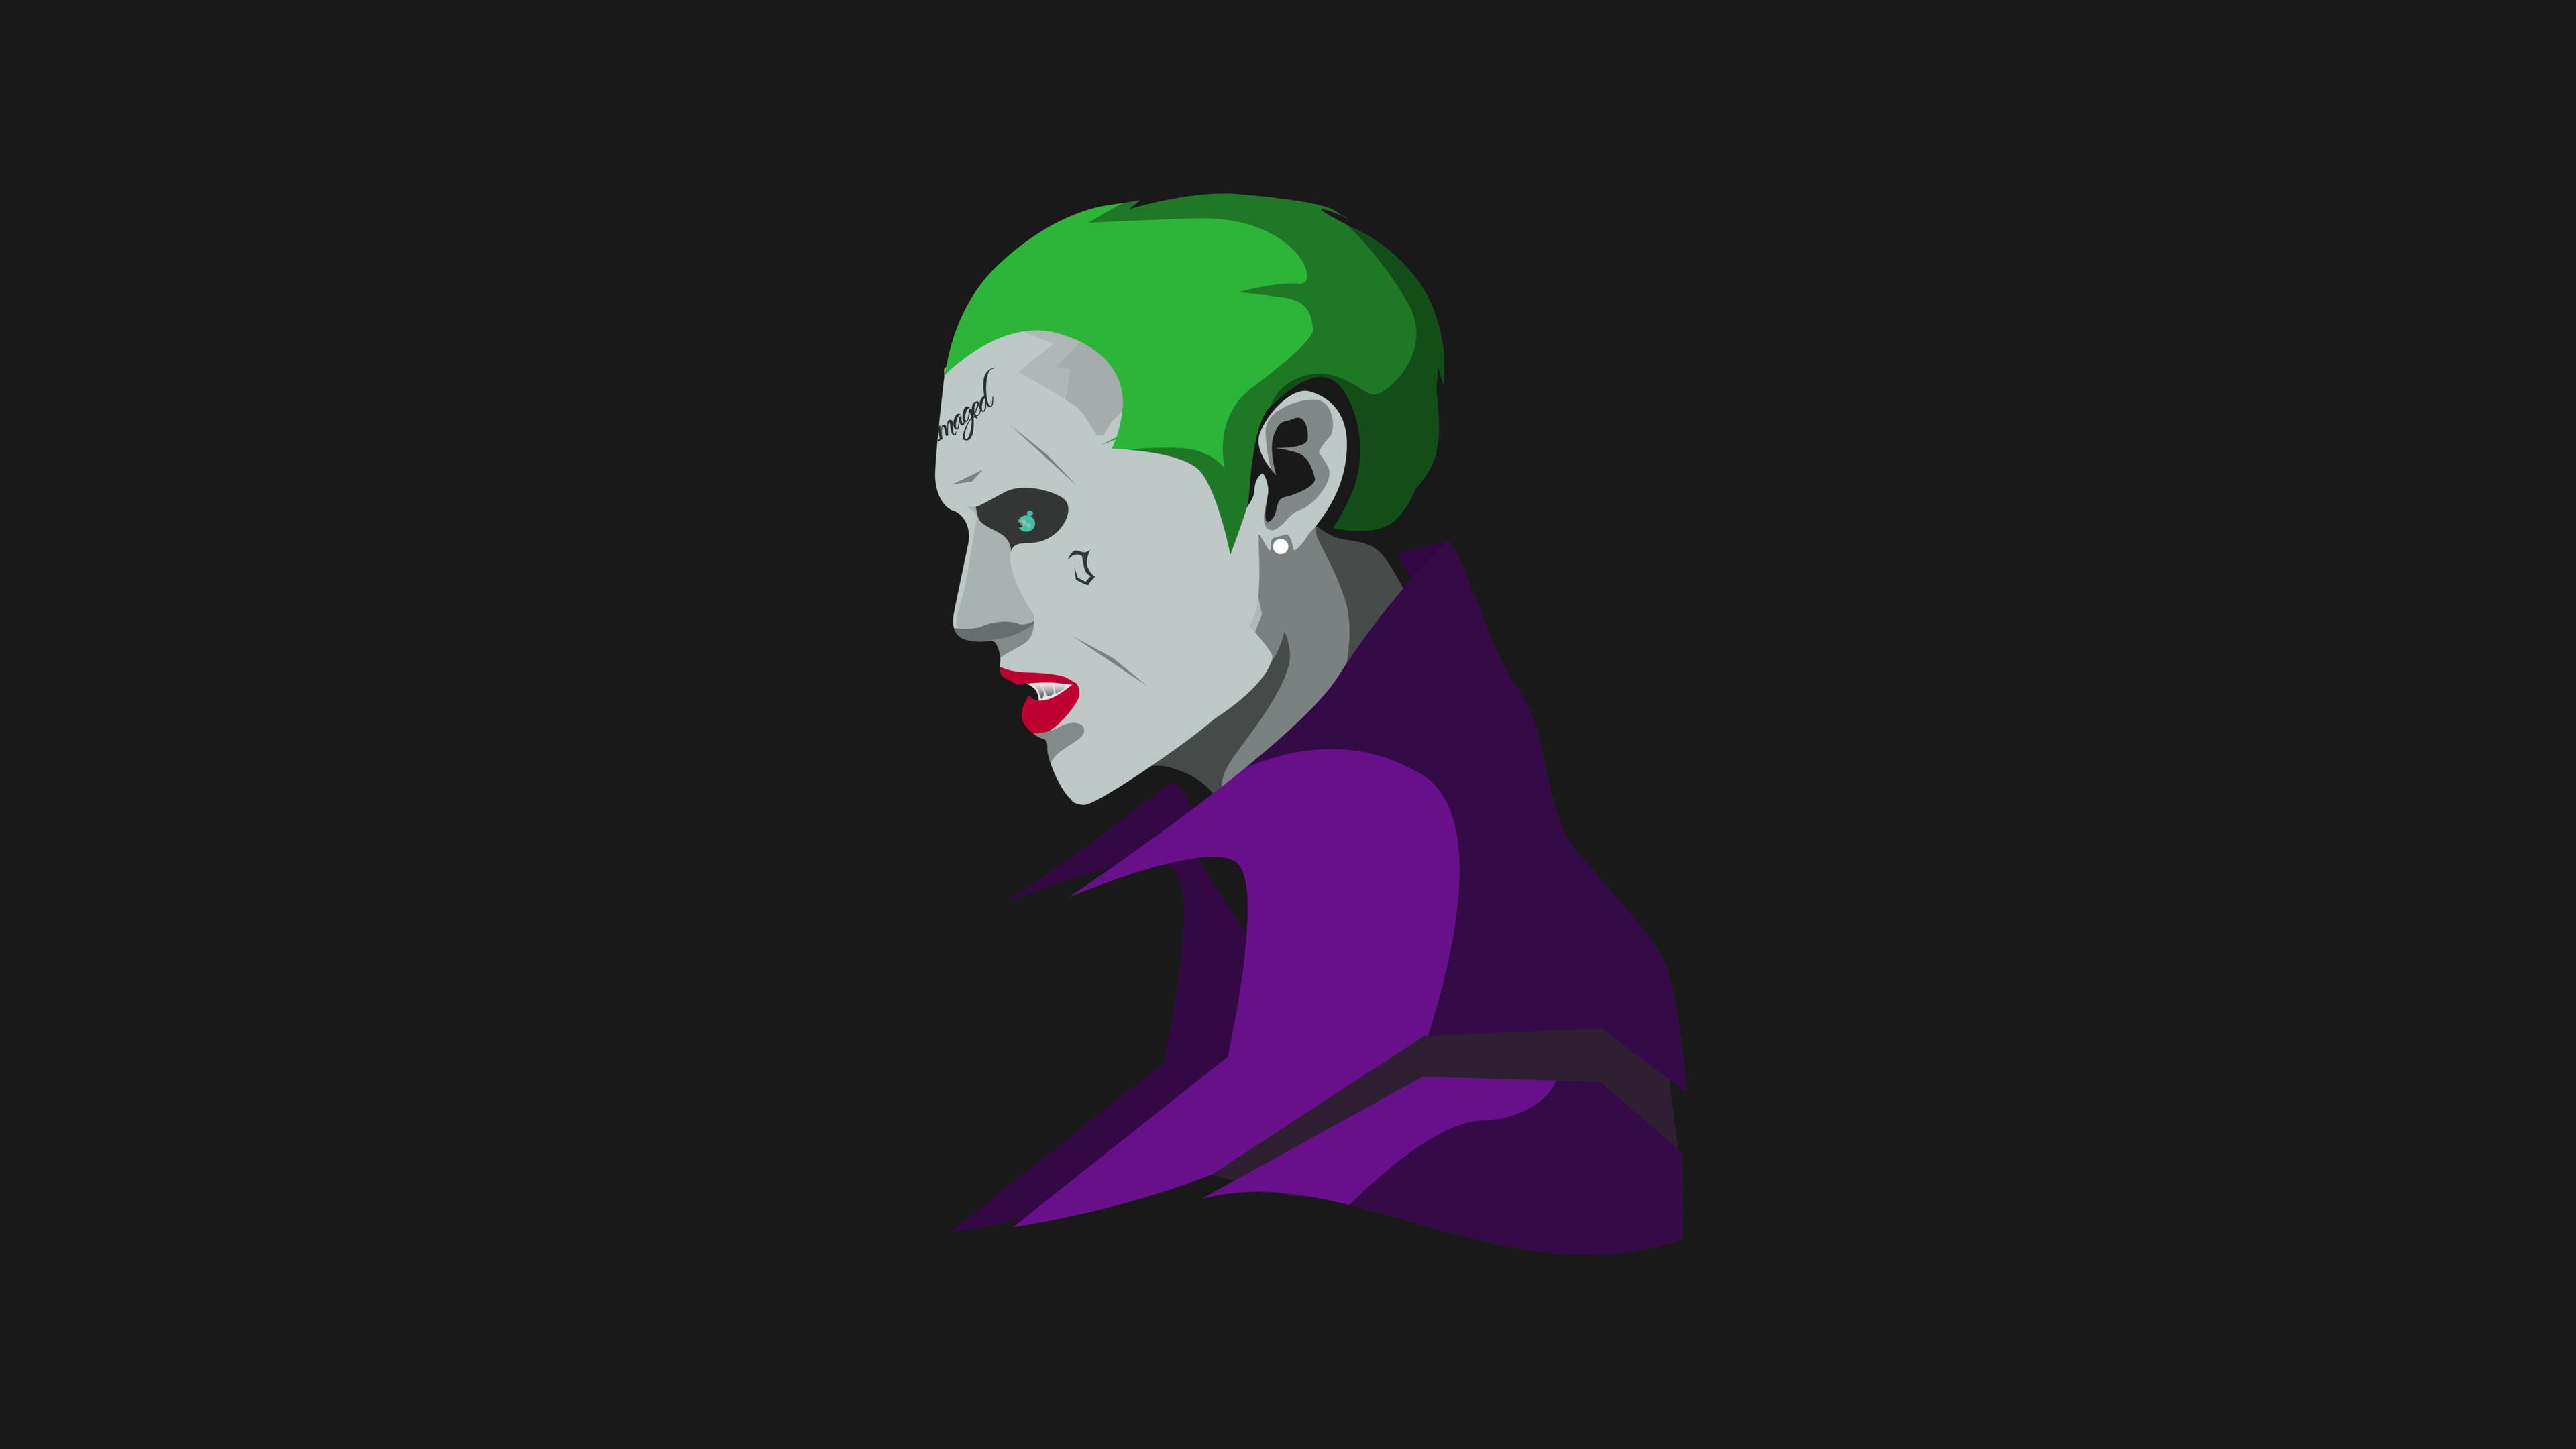 Wallpaper 4k Suicide Squad Joker Minimalism 4k Wallpapers